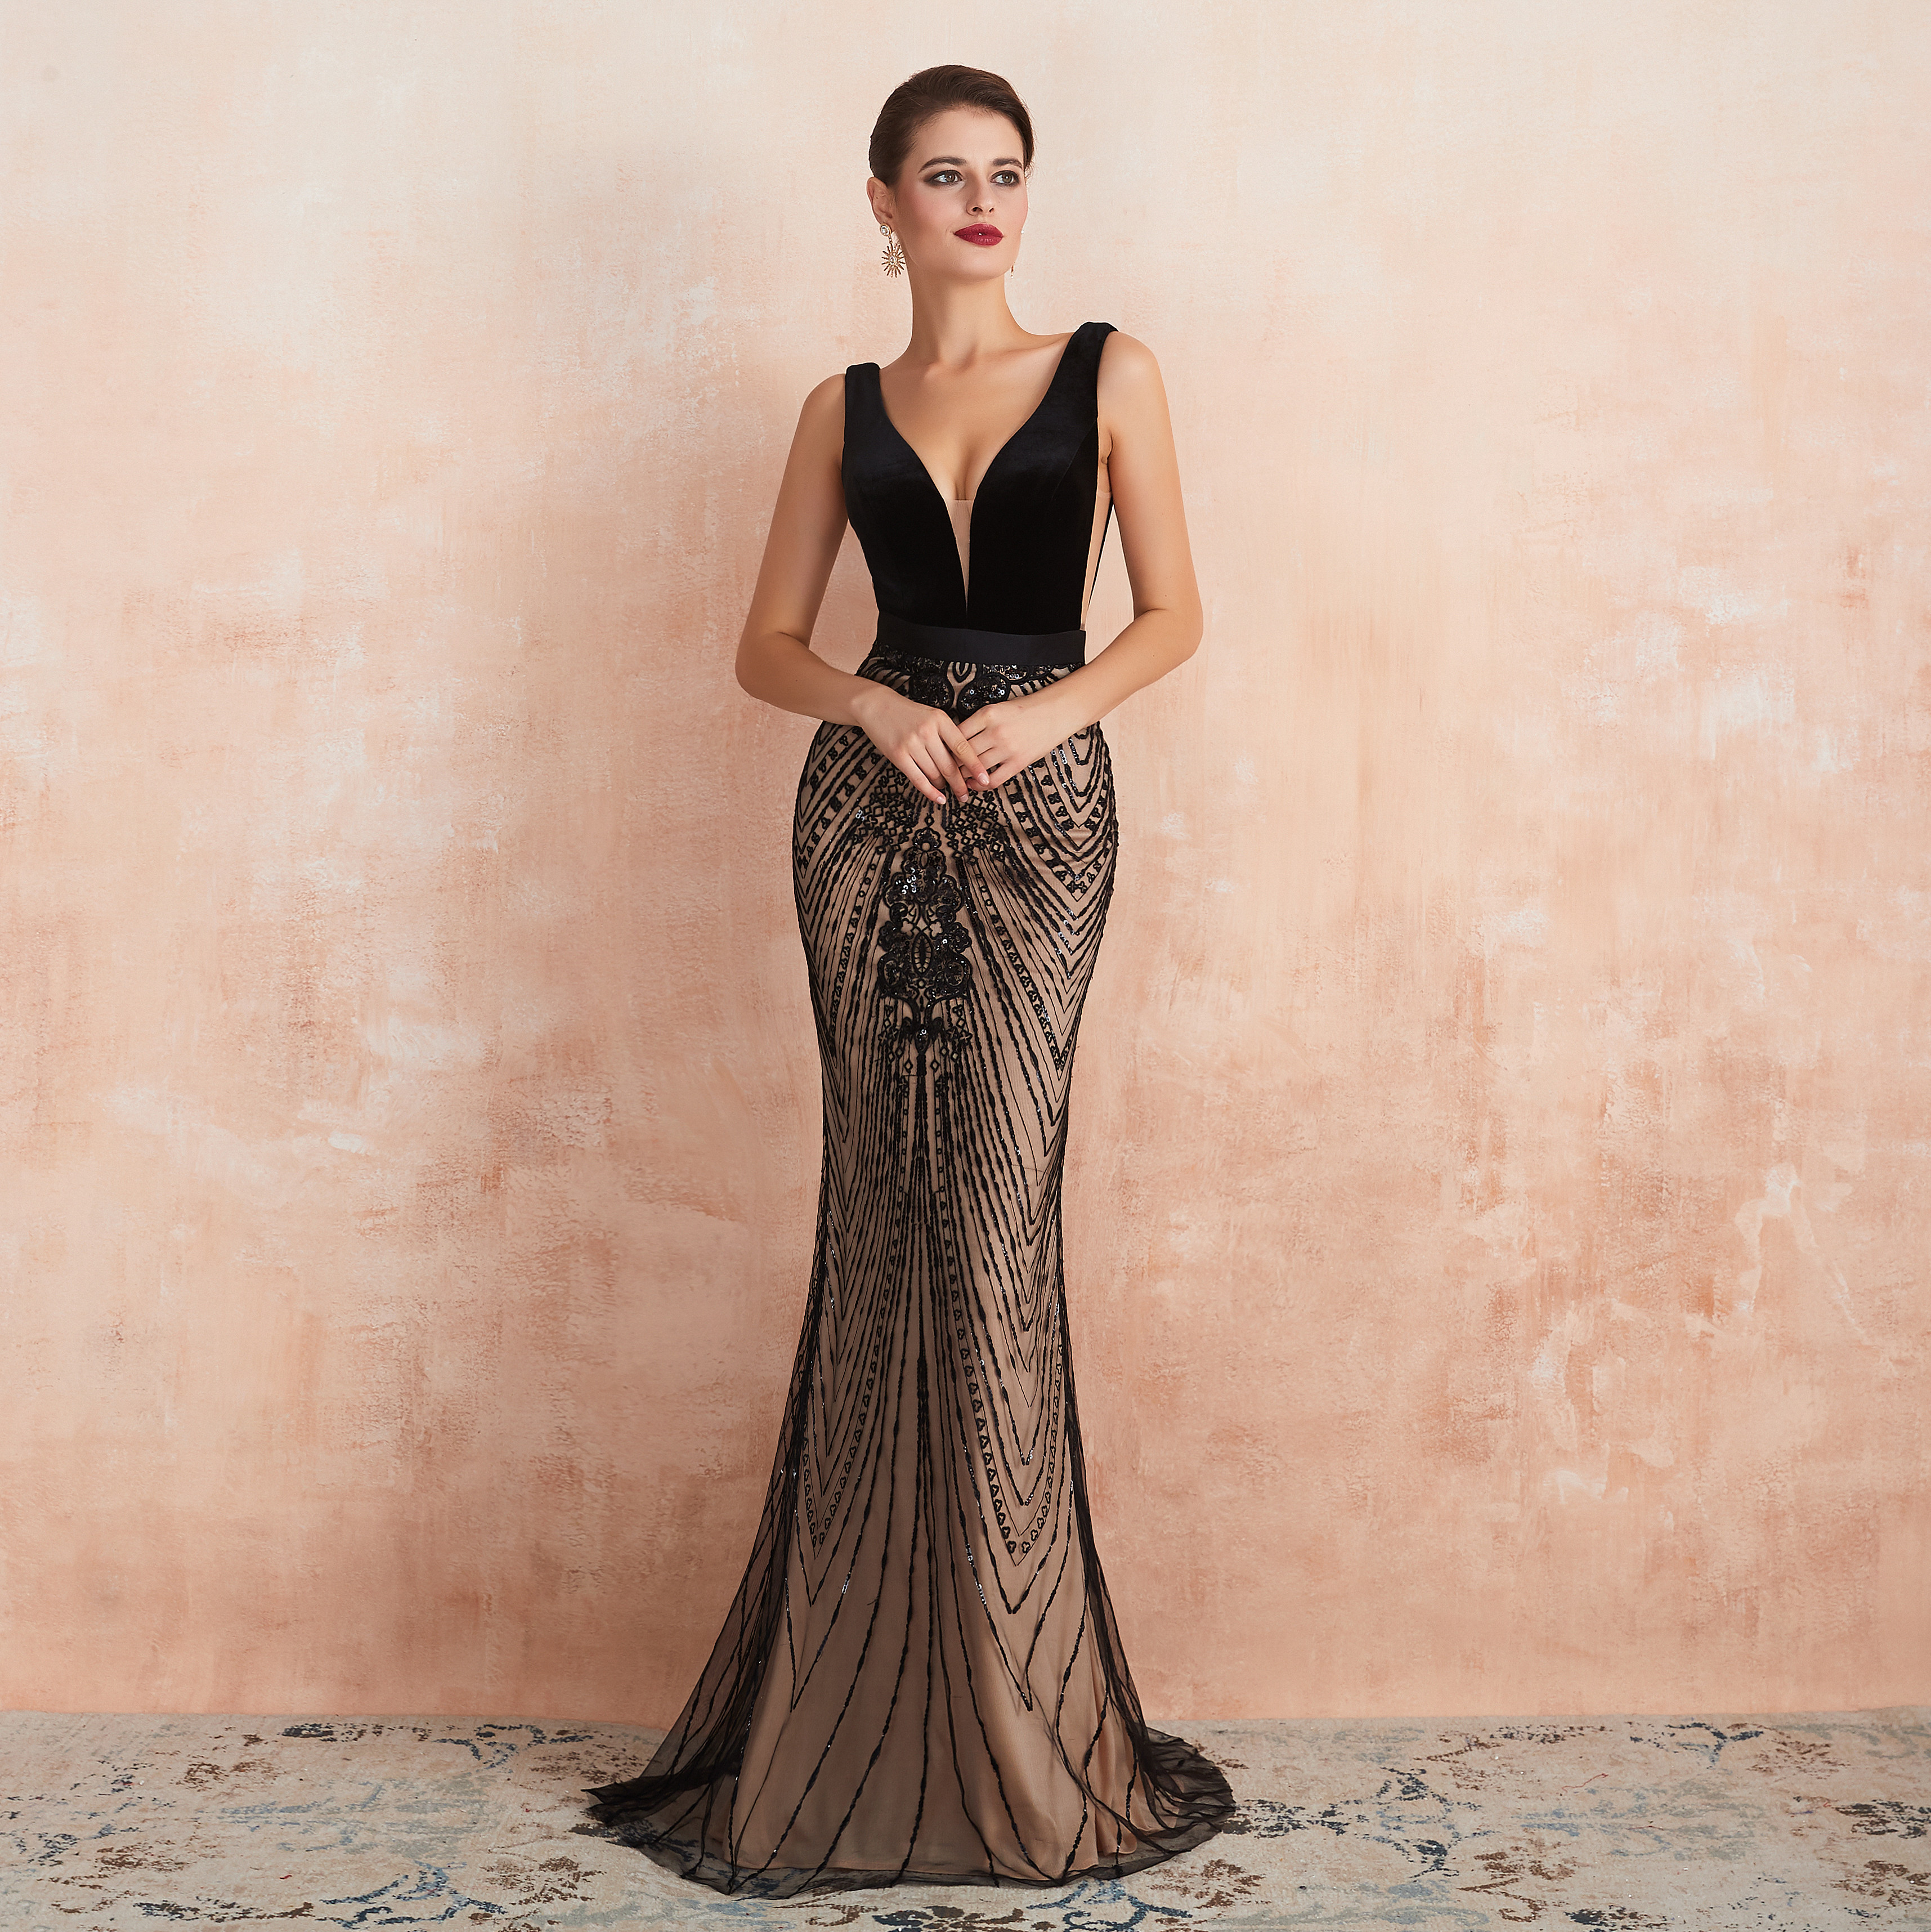 Mermaid Prom Dresses 2019 V Neck Evening Gowns Sequins formal Floor Length  Long Formal Party Dress robe de soiree